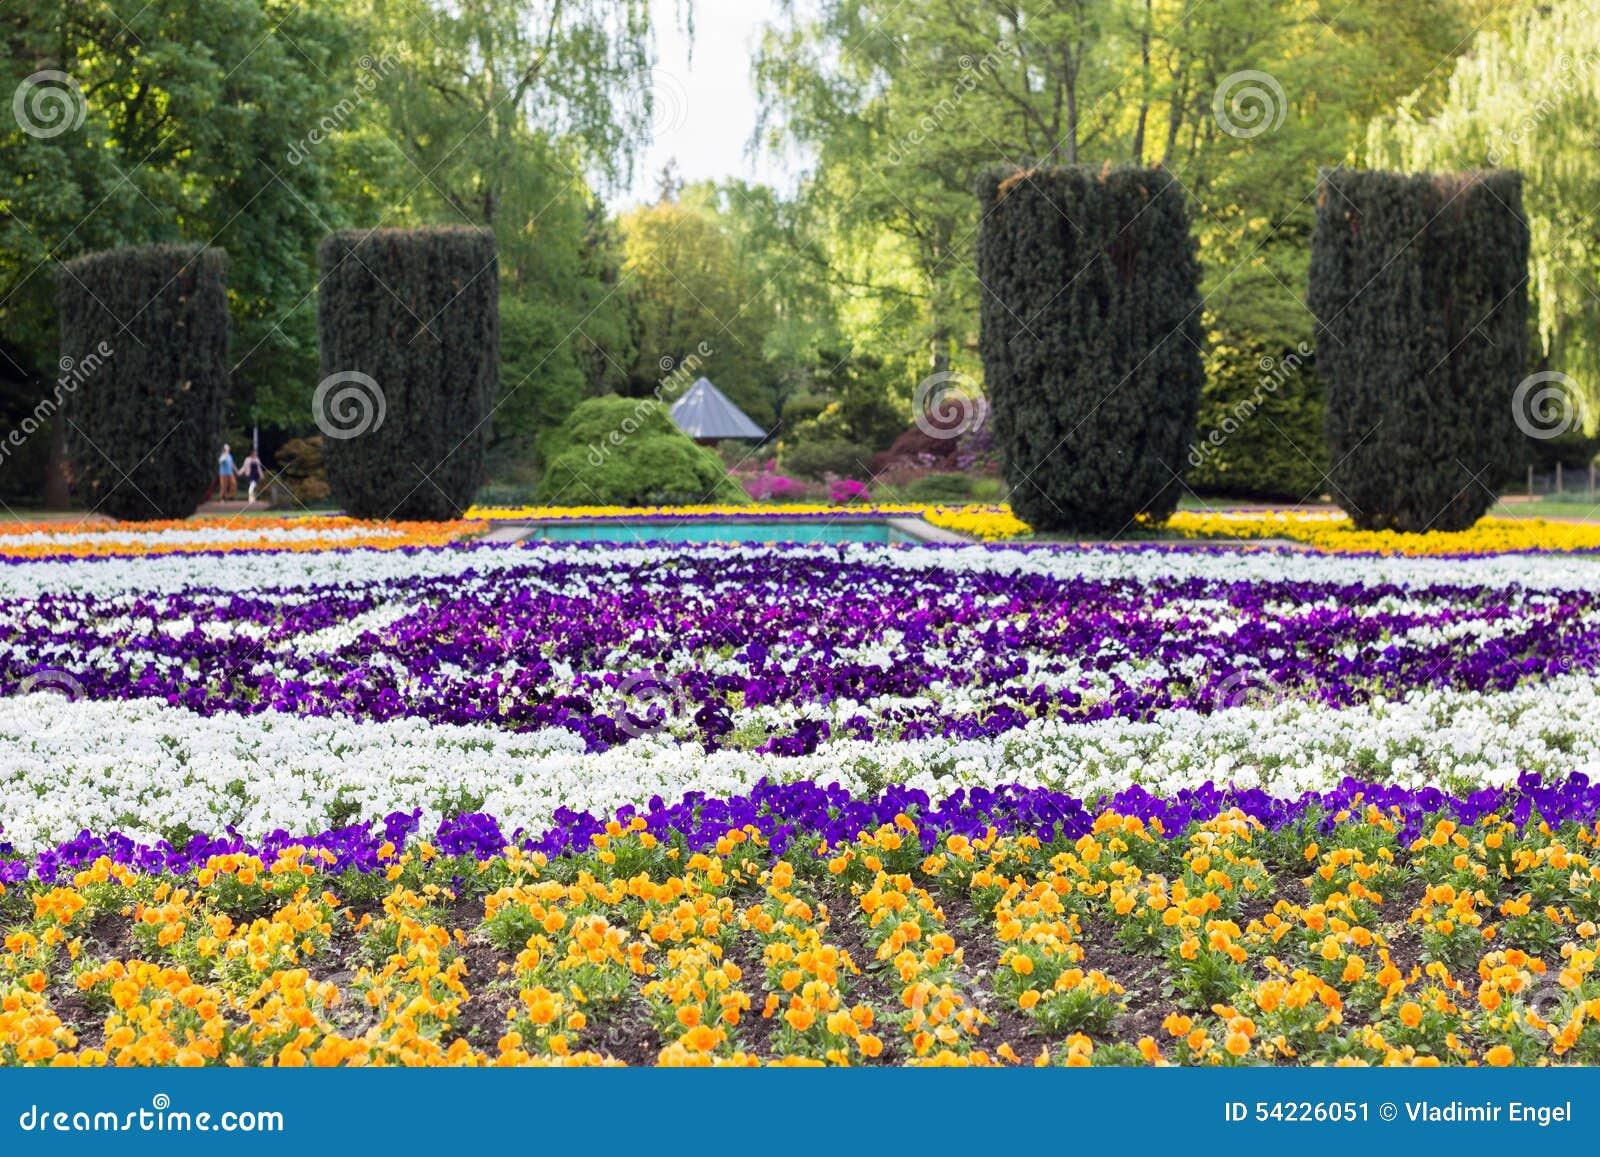 Flowerspring Flowers Outdoor Park Flowers Garden Stock Image